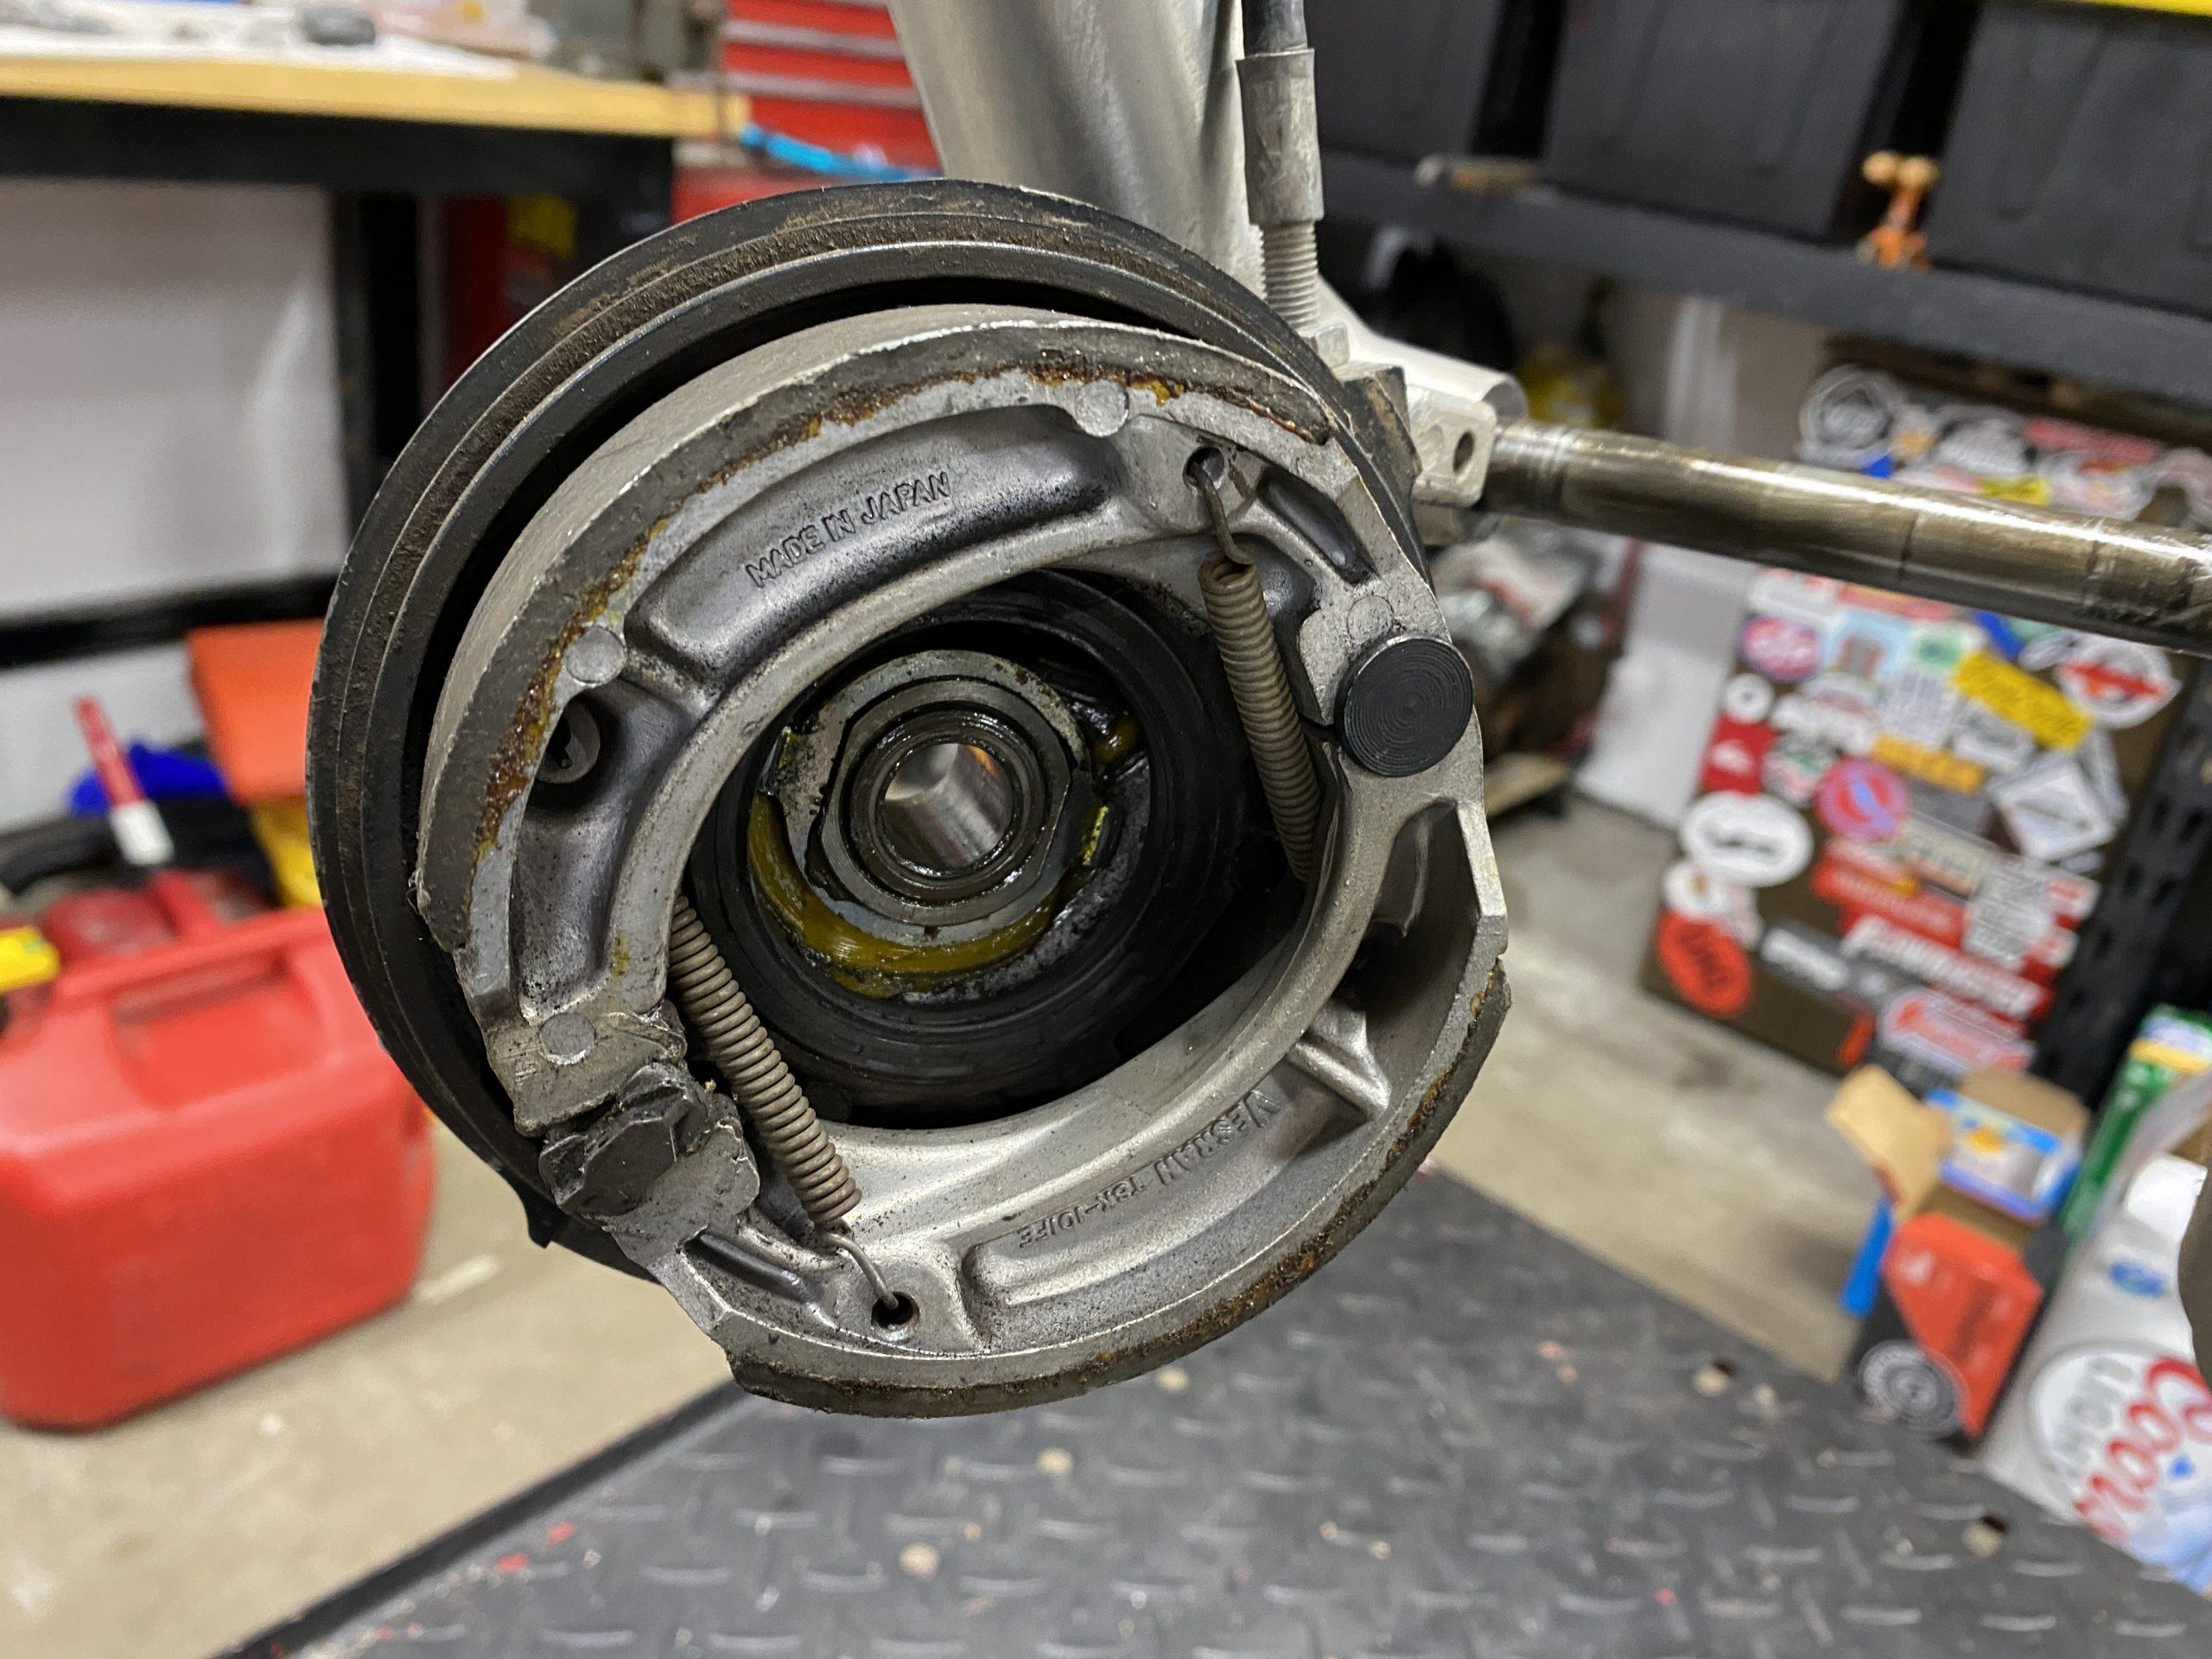 XR200 drum brake